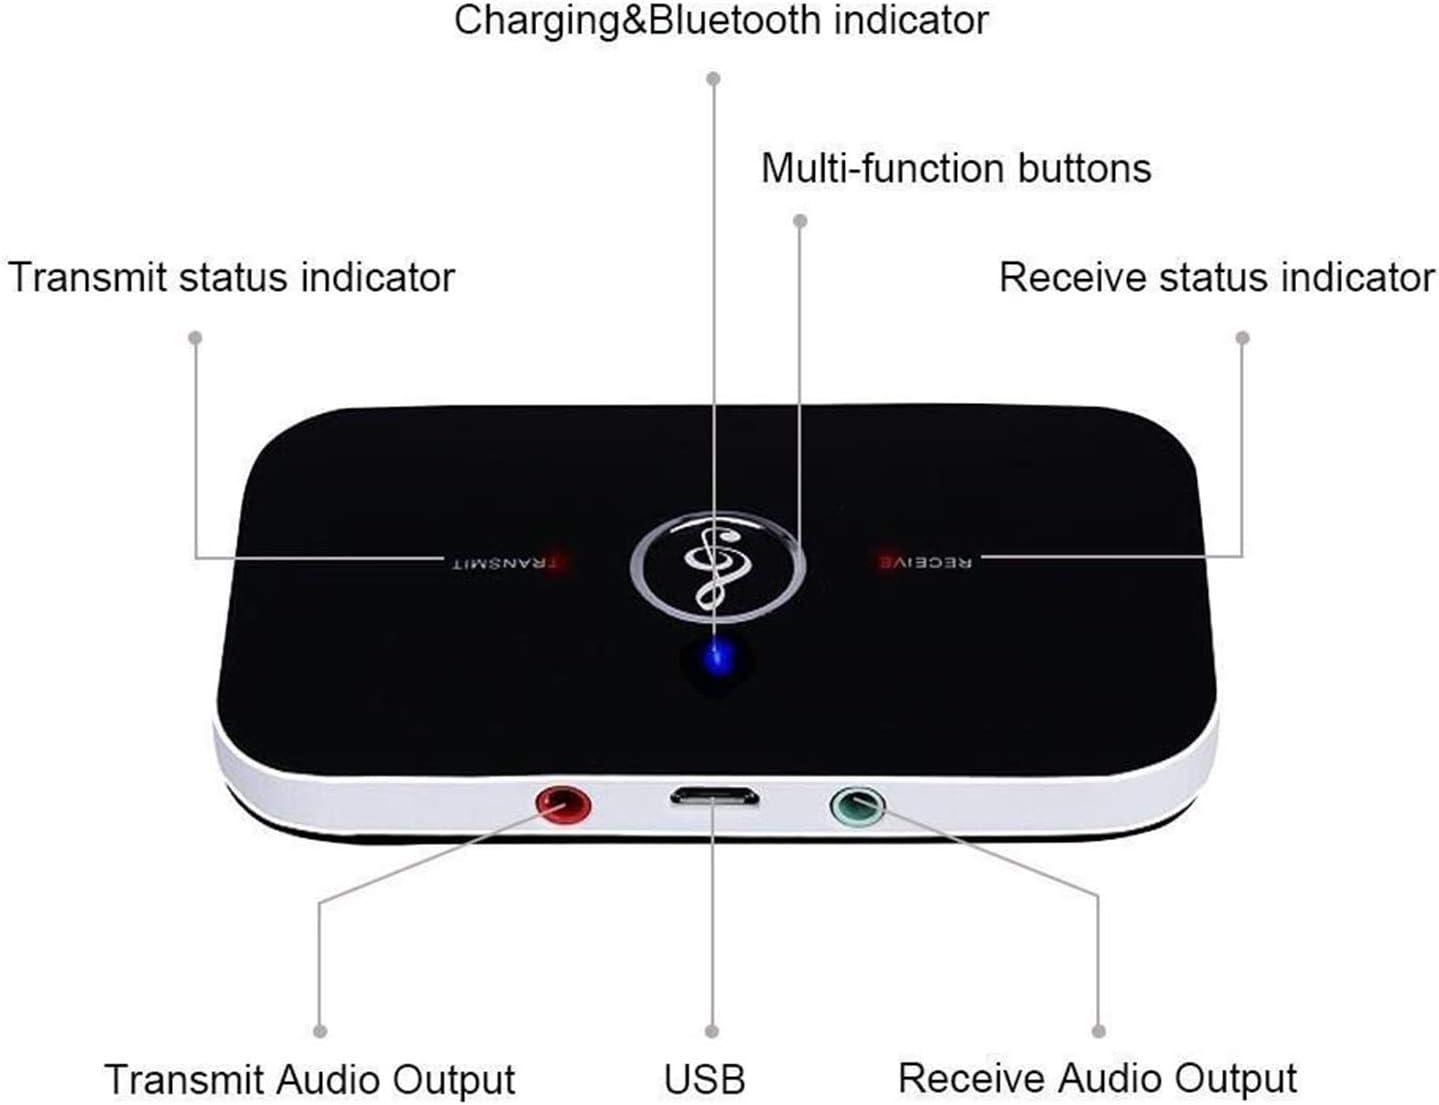 Receptor Transmisor Bluetooth,Ozvavzk Transmisor y Receptor Bluetooth Adaptador 5.0 Inalámbrico 2 en 1 Audio Kit con Salida Audio 3,5 mm RCA Audio